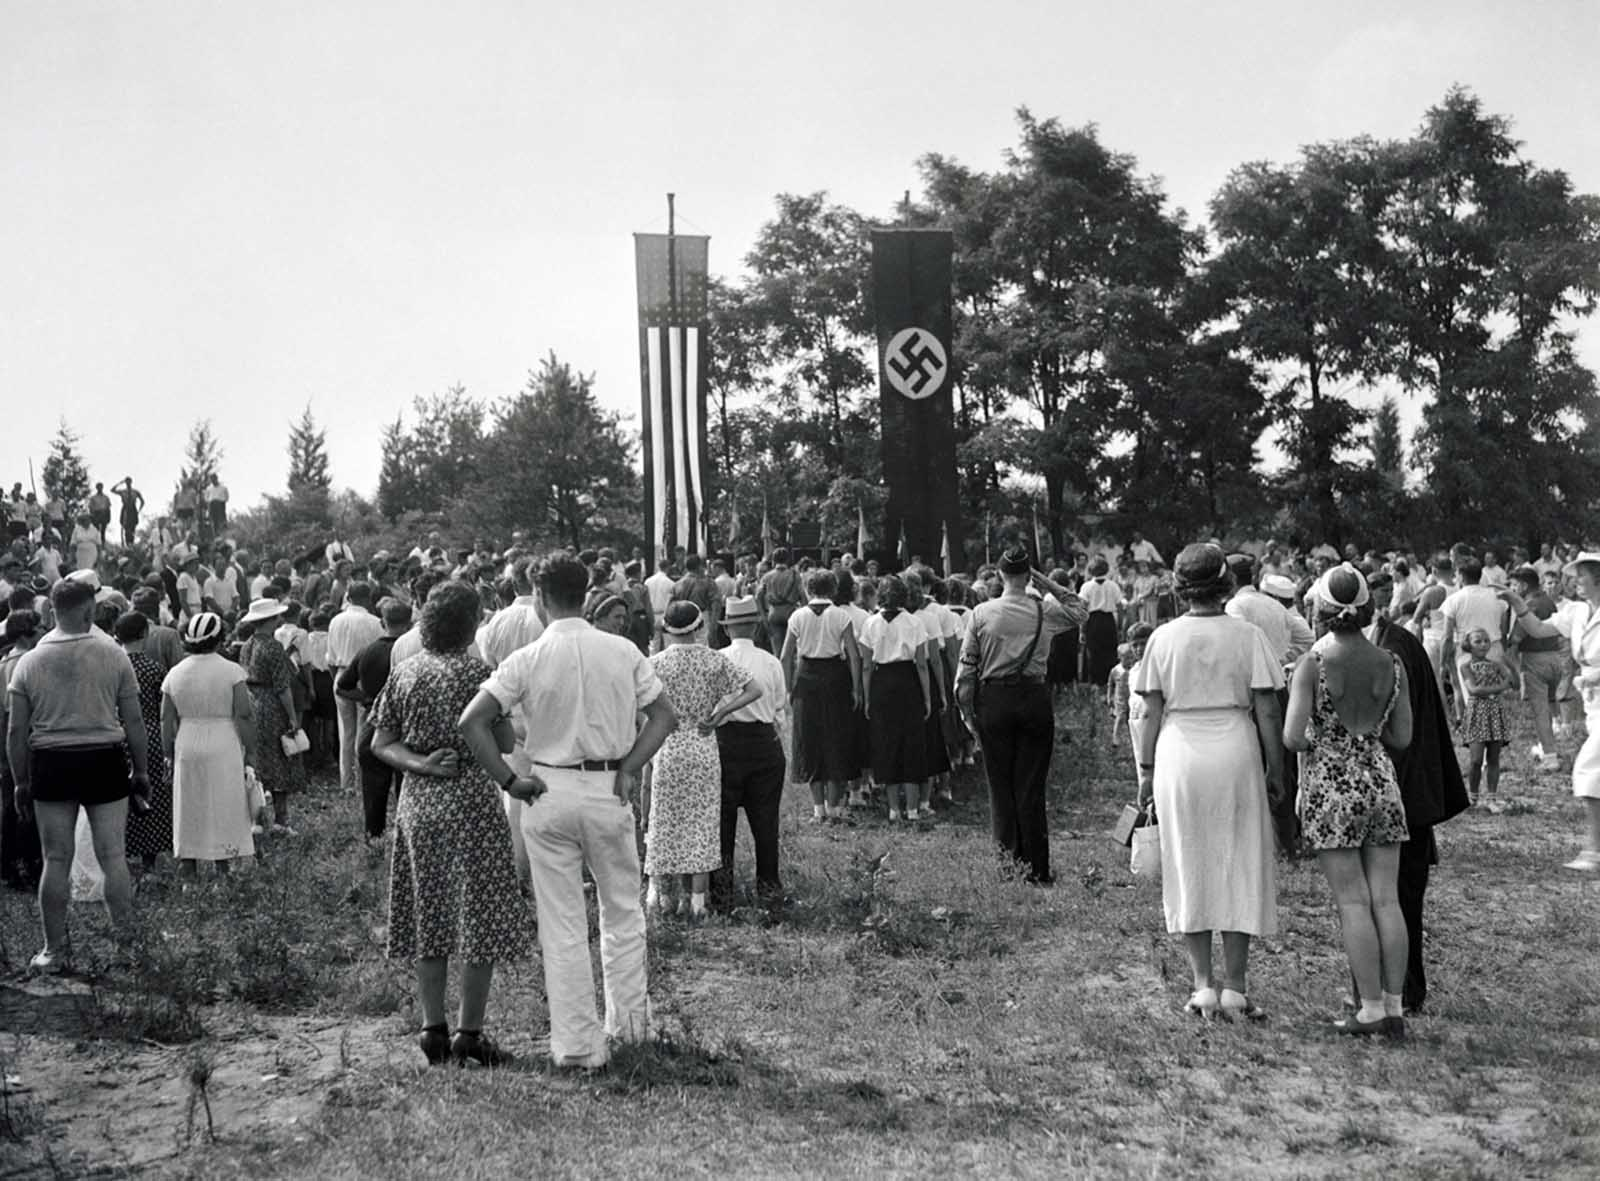 American Nazi Bund Rally near Yaphank, New York, in 1937.